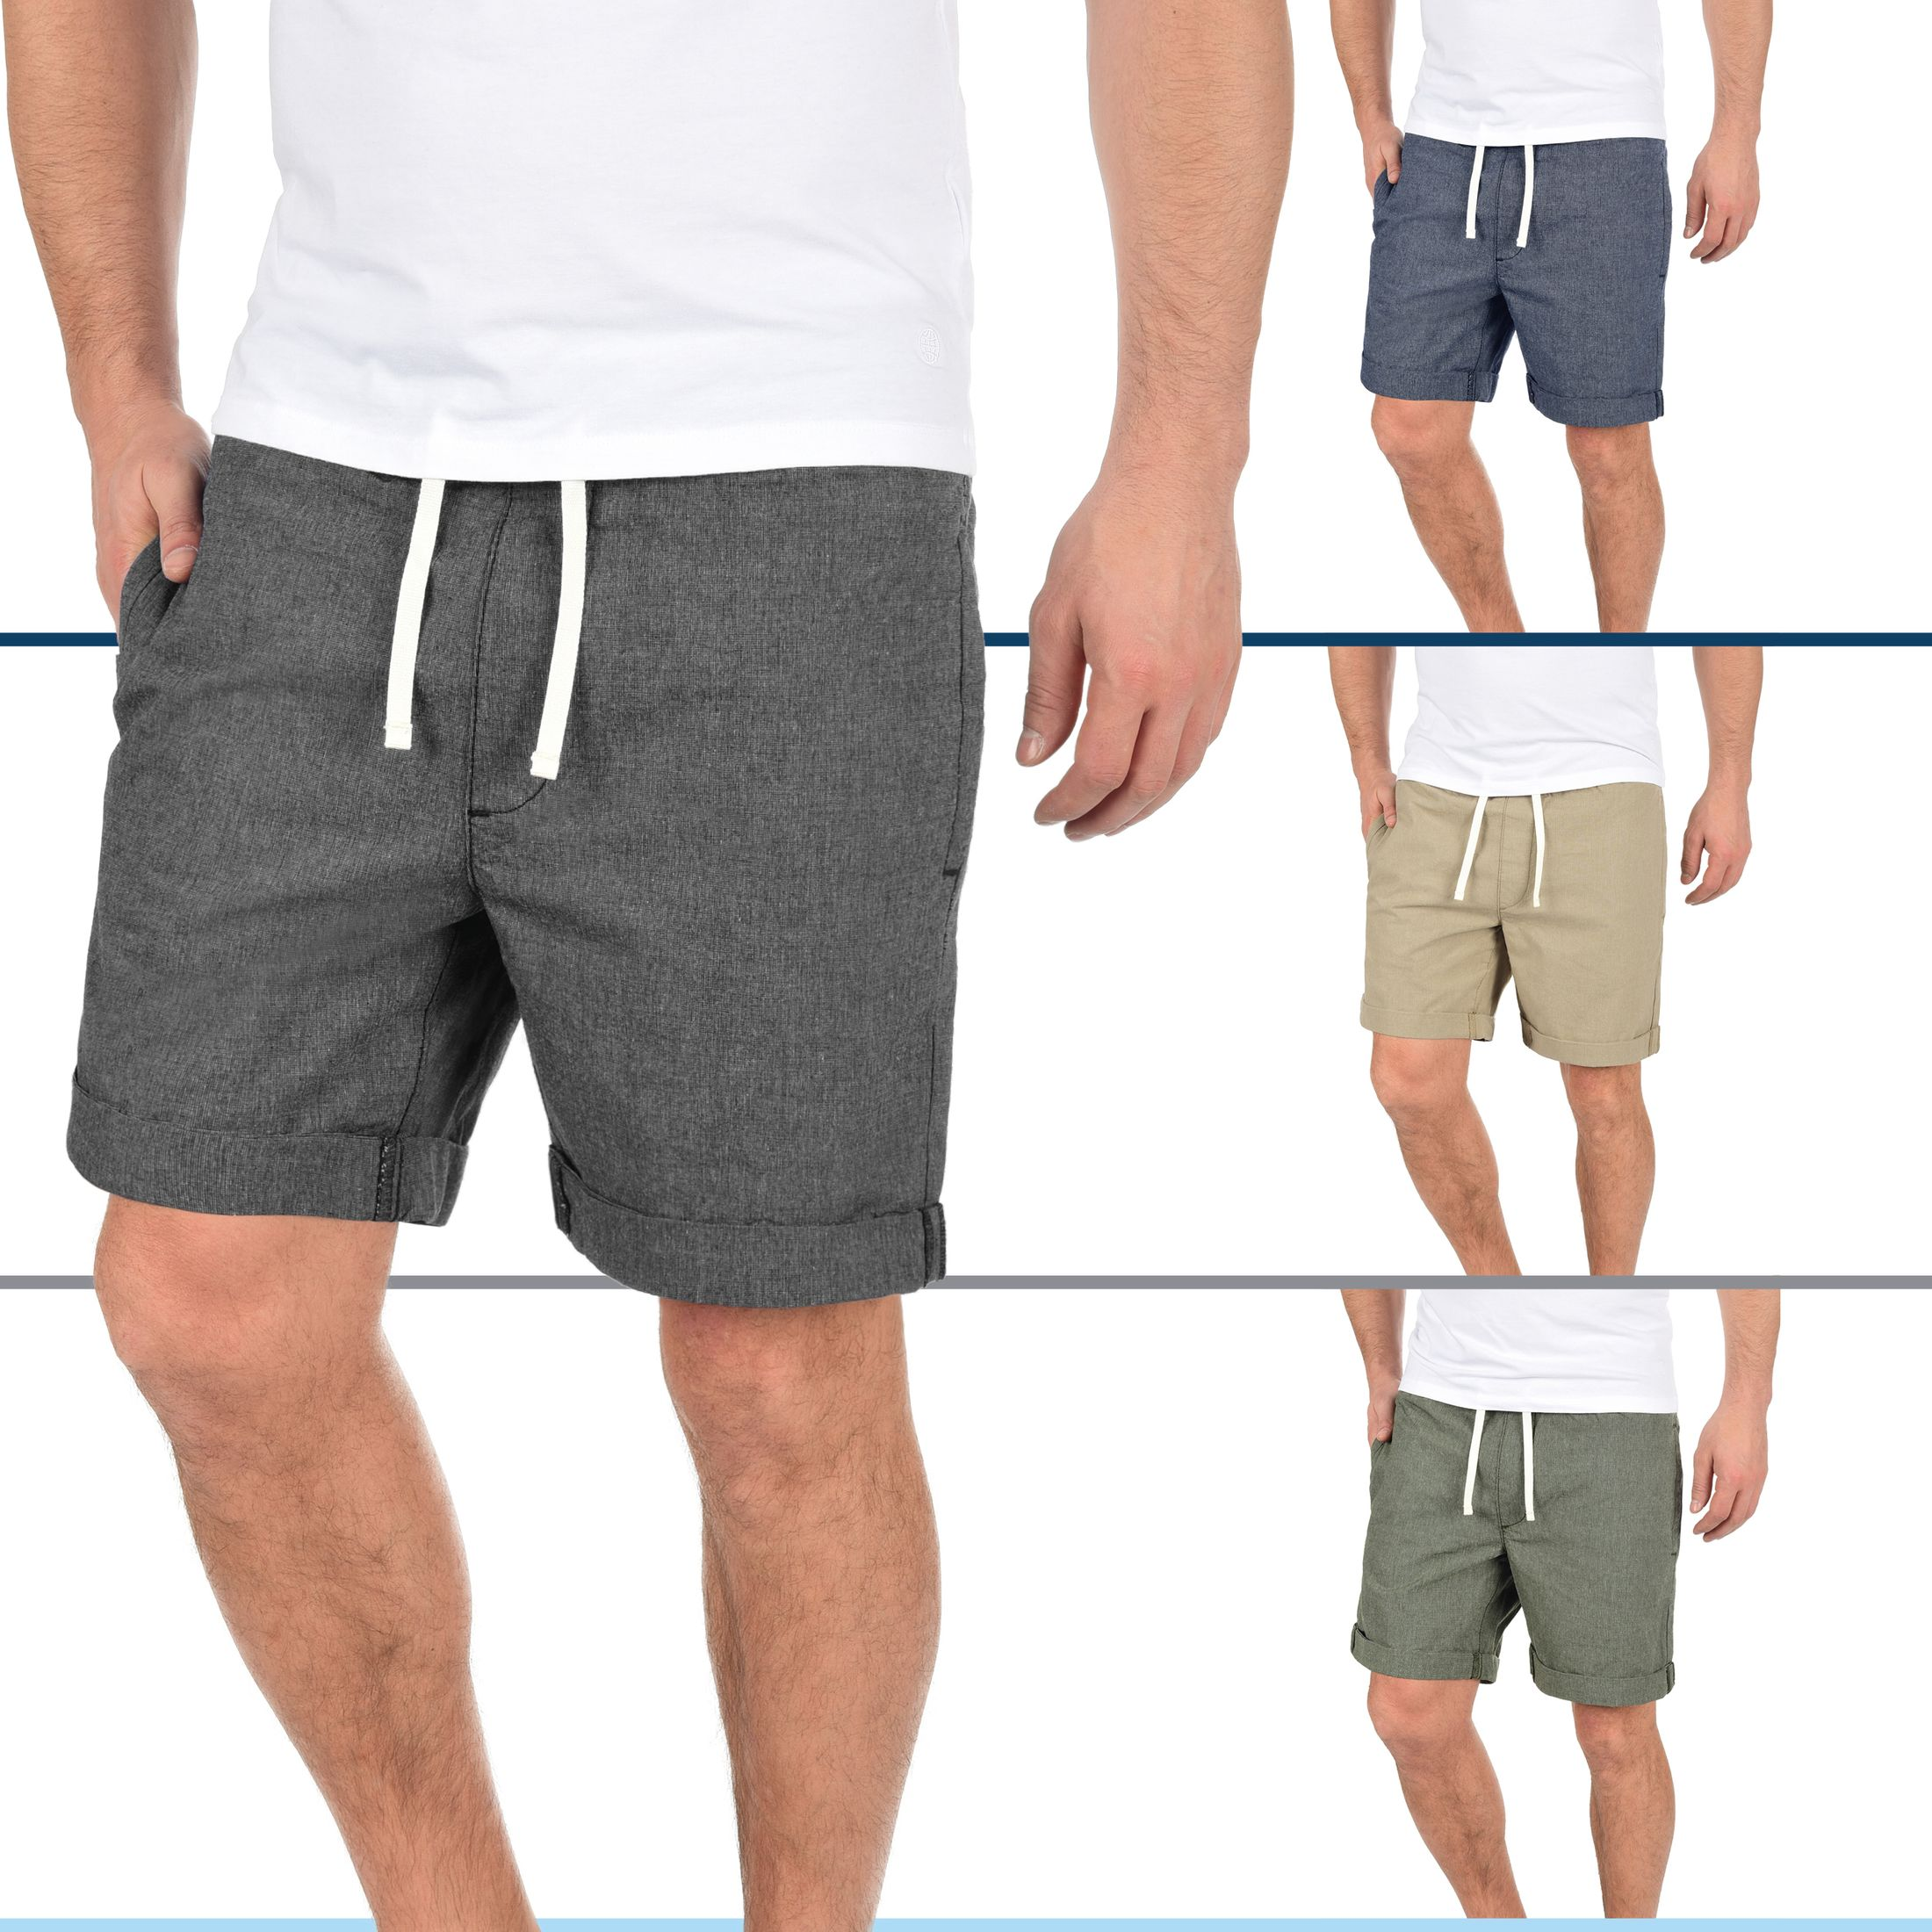 PRODUKT Senór Shorts kurze Hose